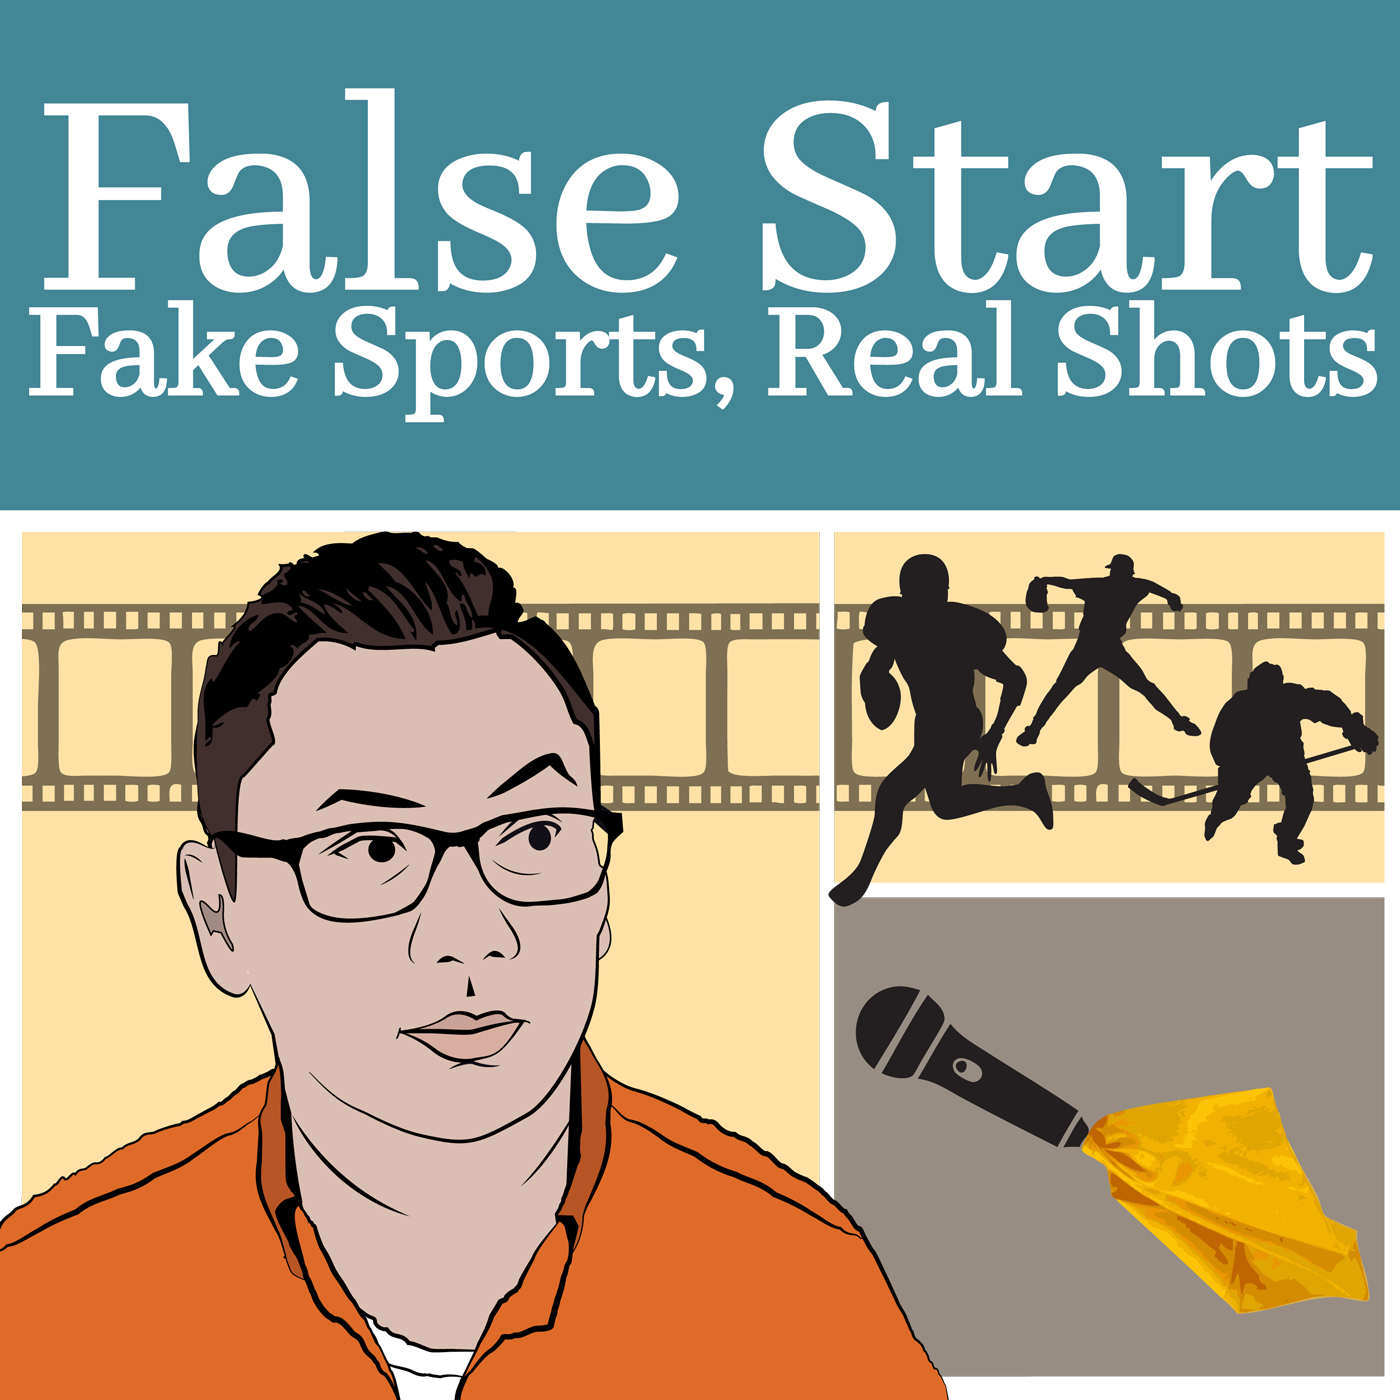 False Start; Fake Sports, Real Shots